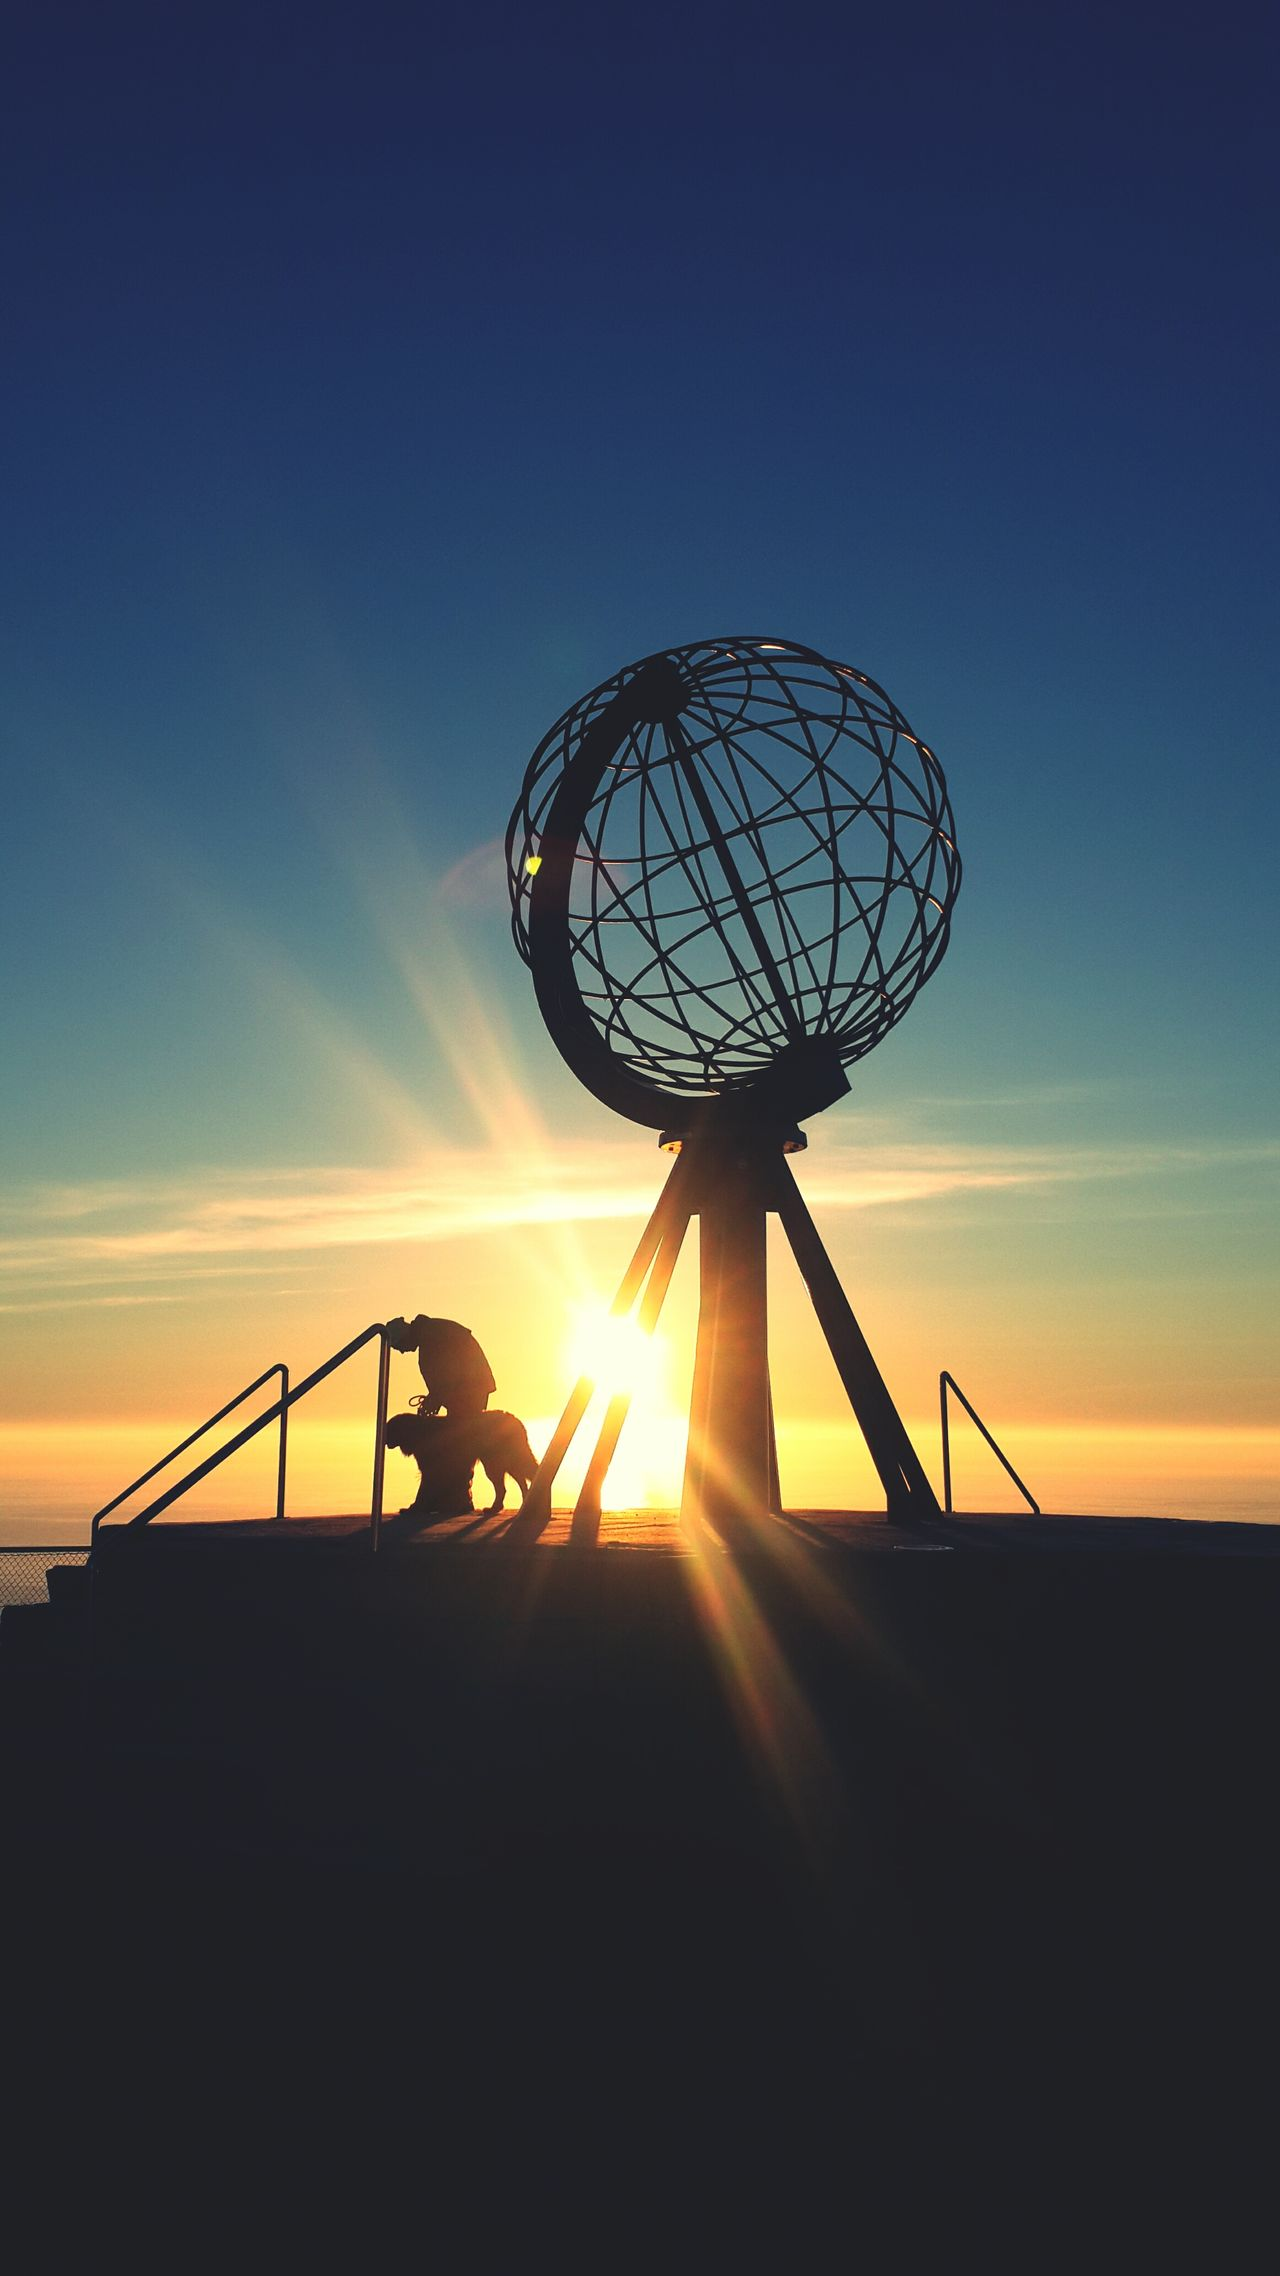 Midnightsun Midnight Sun Nordkapp Norway Dog Sunset Sillhouette Color Of Life